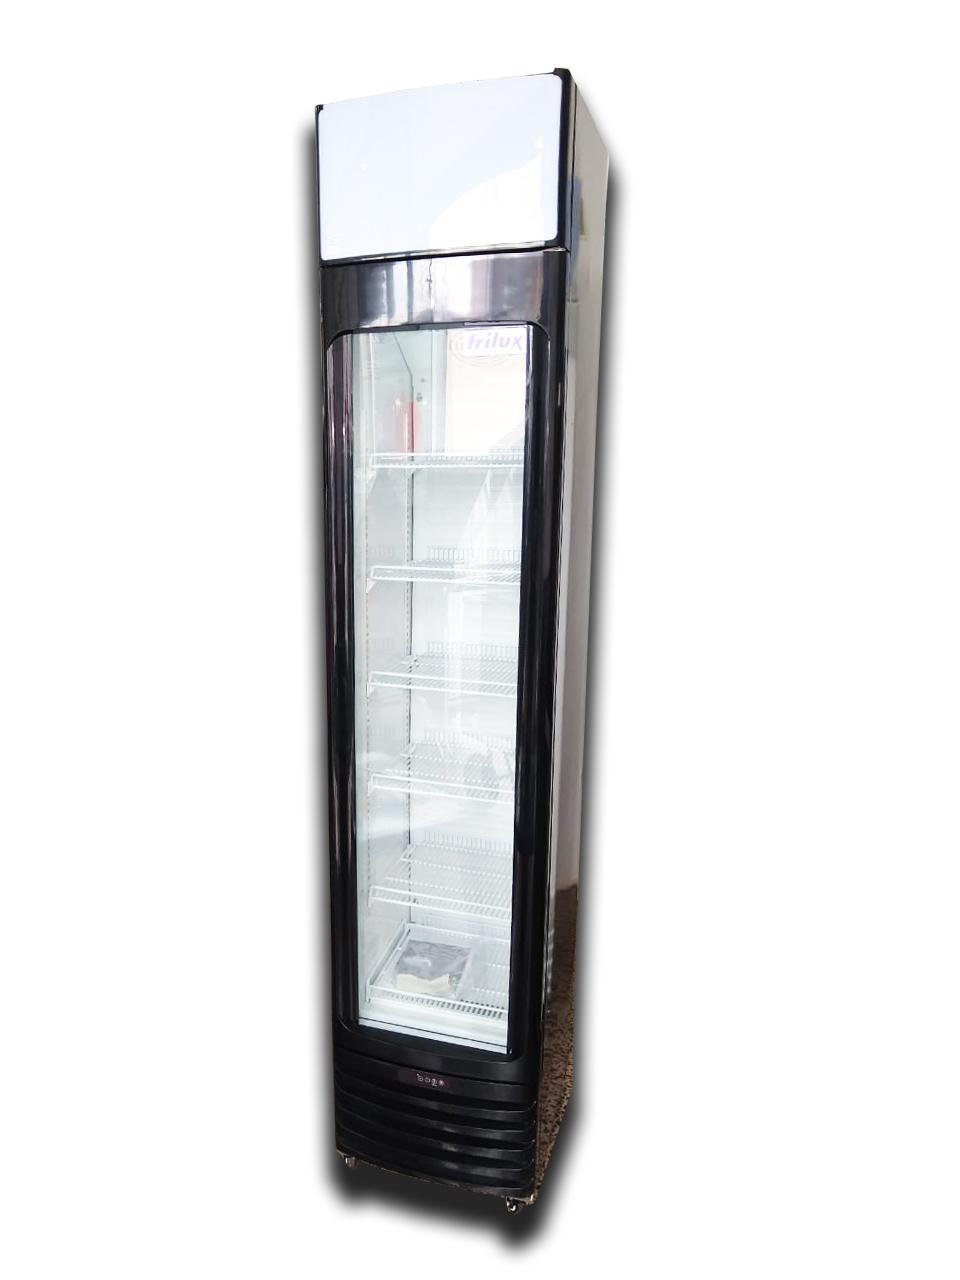 Expositor Visa-Cooler porta de vidro capacidade 150l preto 220V RF-003-ST Frilux